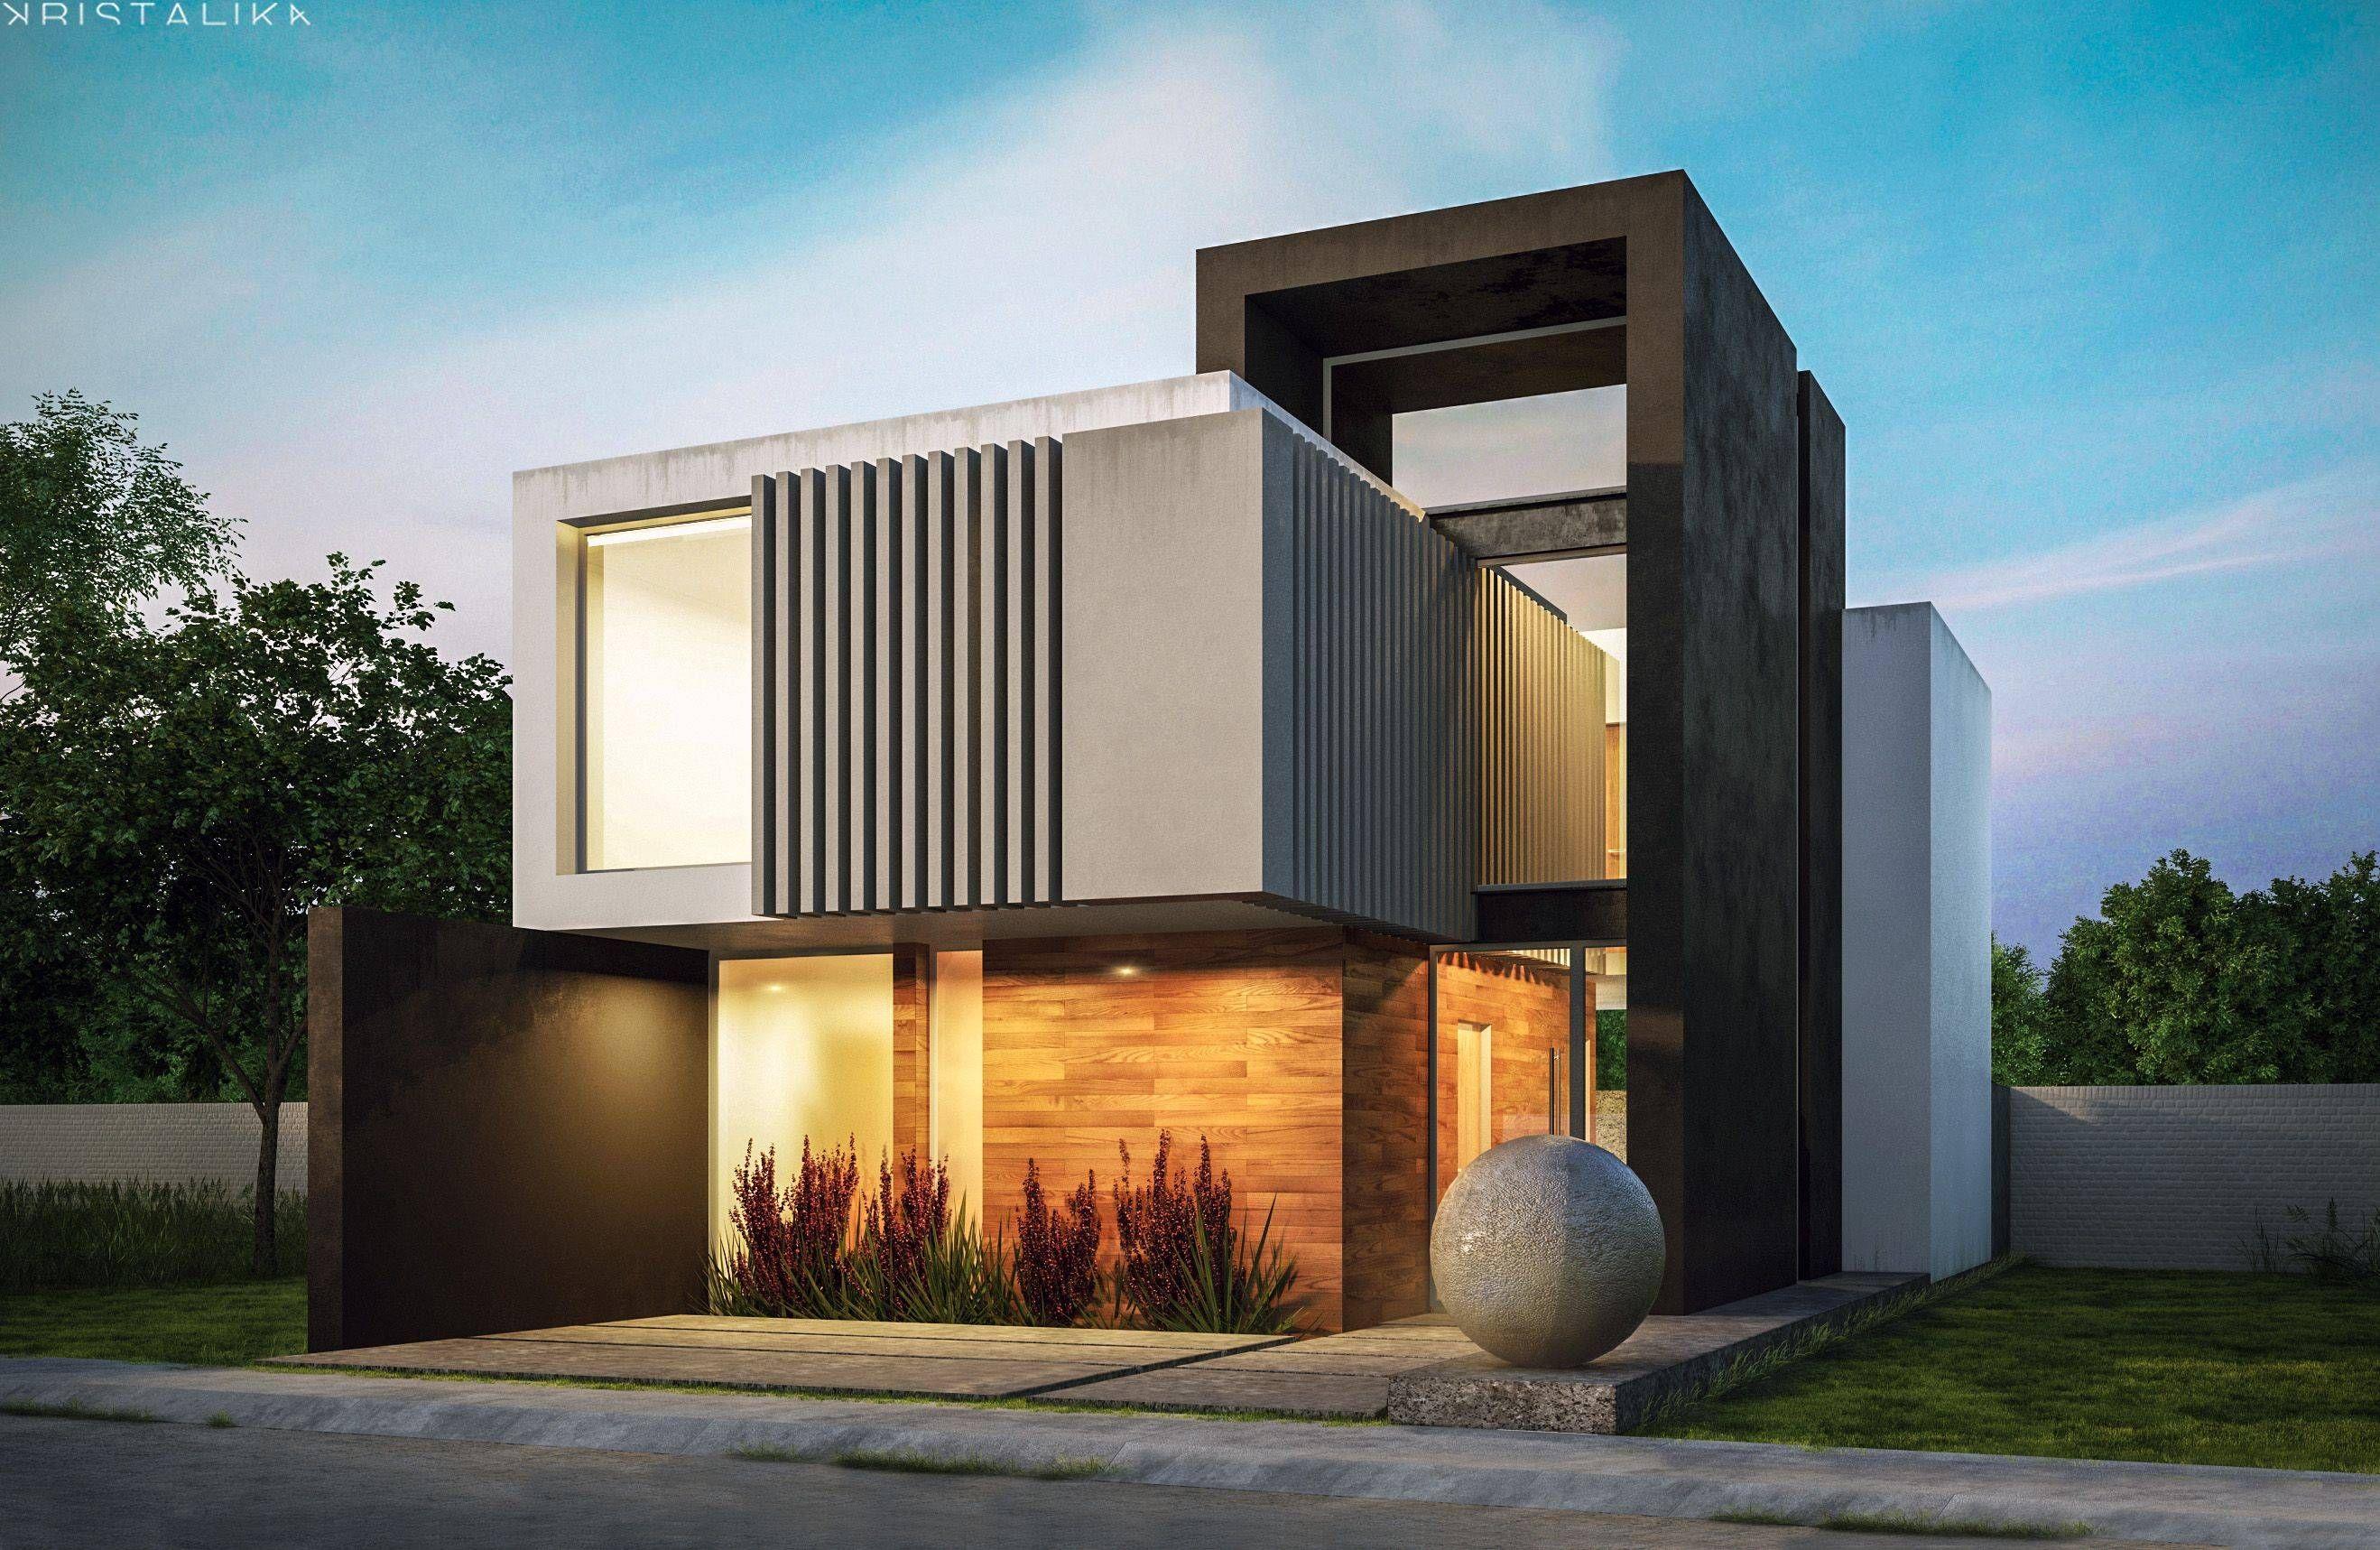 Ultra Modern House Simple Ideas Contemporary Minimalist Design Lovely 2637 1717 Modern Minimalist House Facade House Modern House Facades